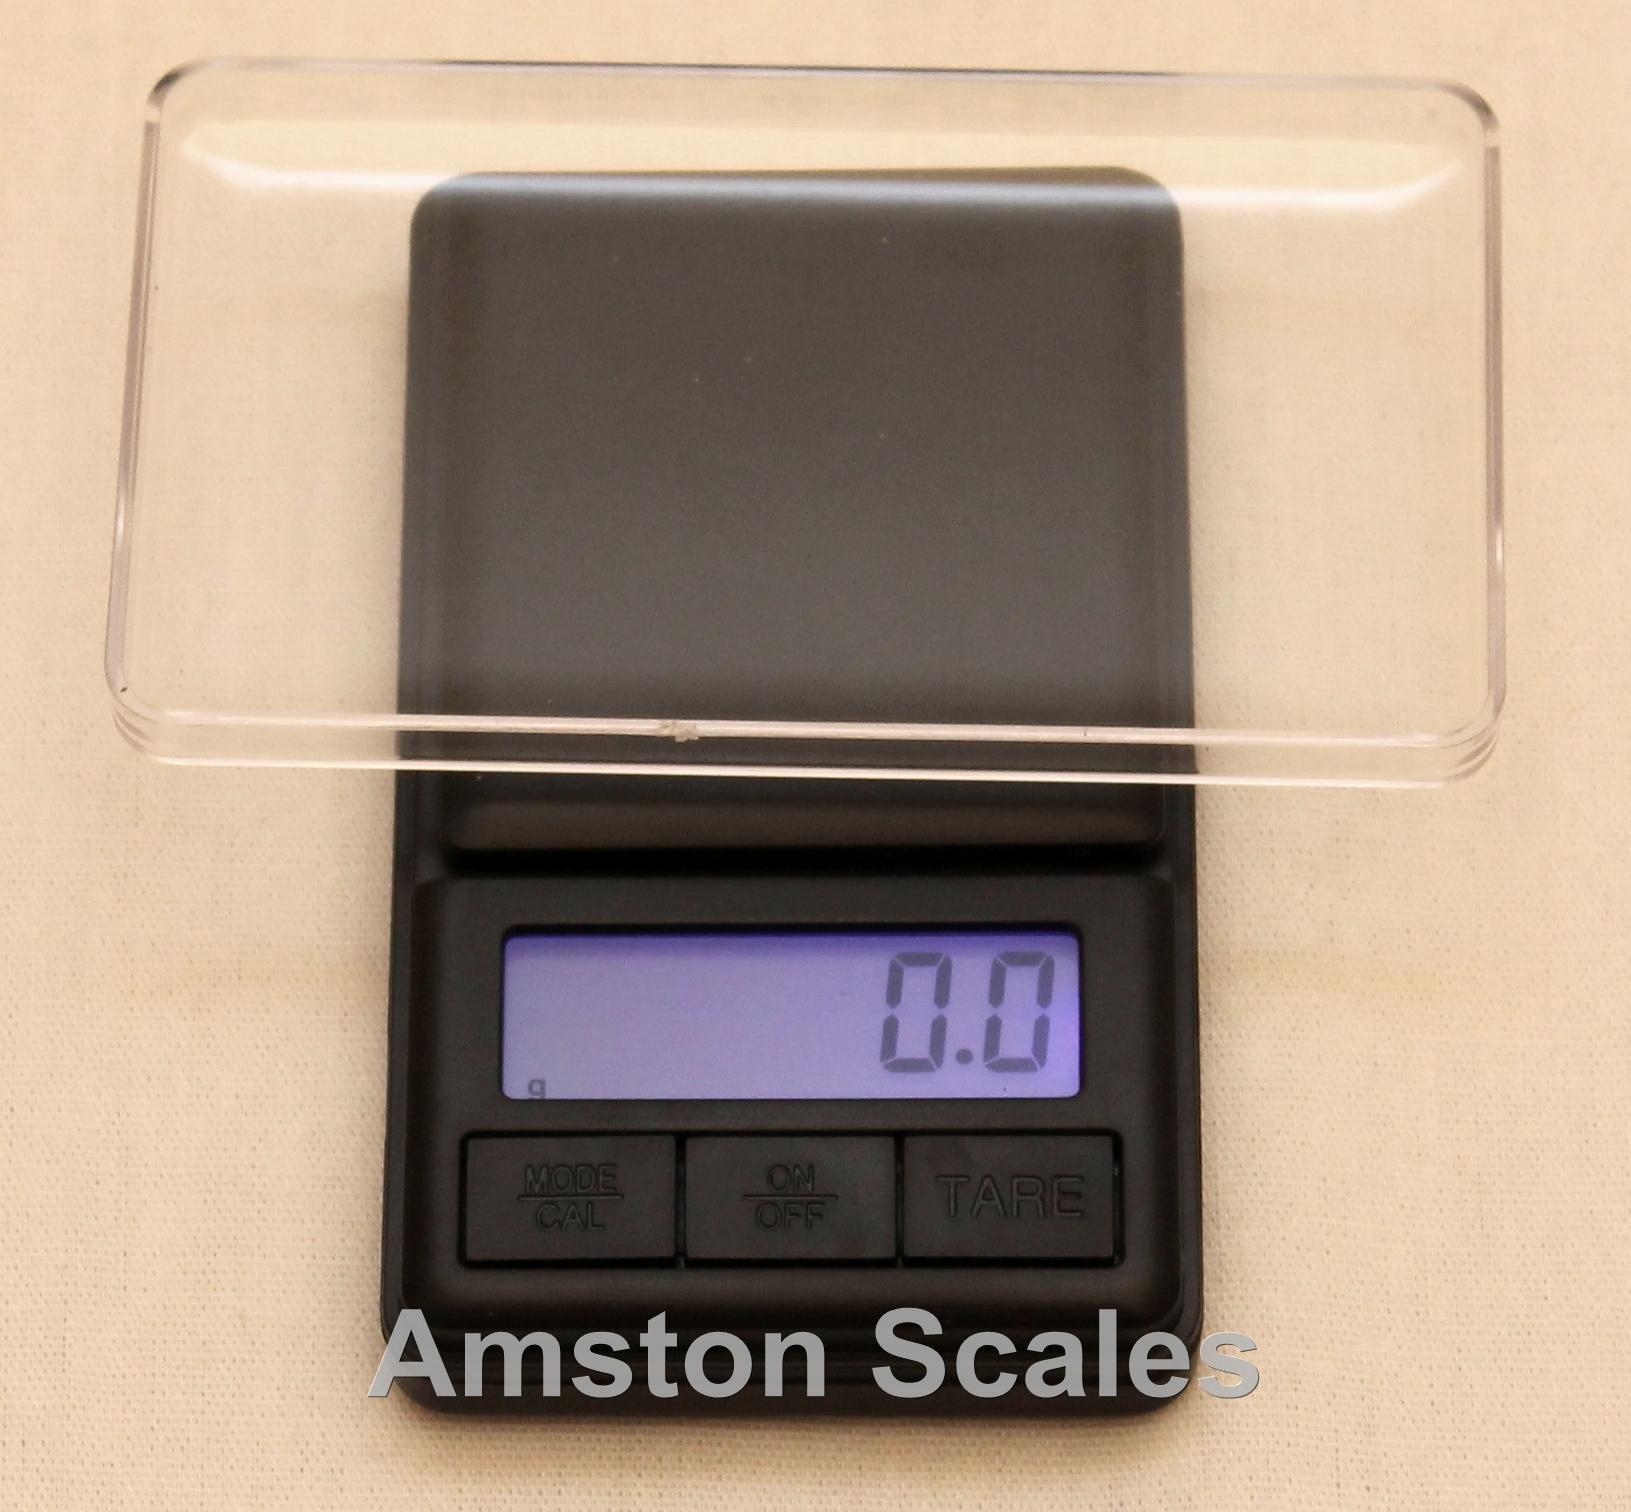 500 x 0.1 Gram Digital Pocket Scale Grain Carat Ounce Troy Pennyweight Gunpowder Gold Silver Gem Compact